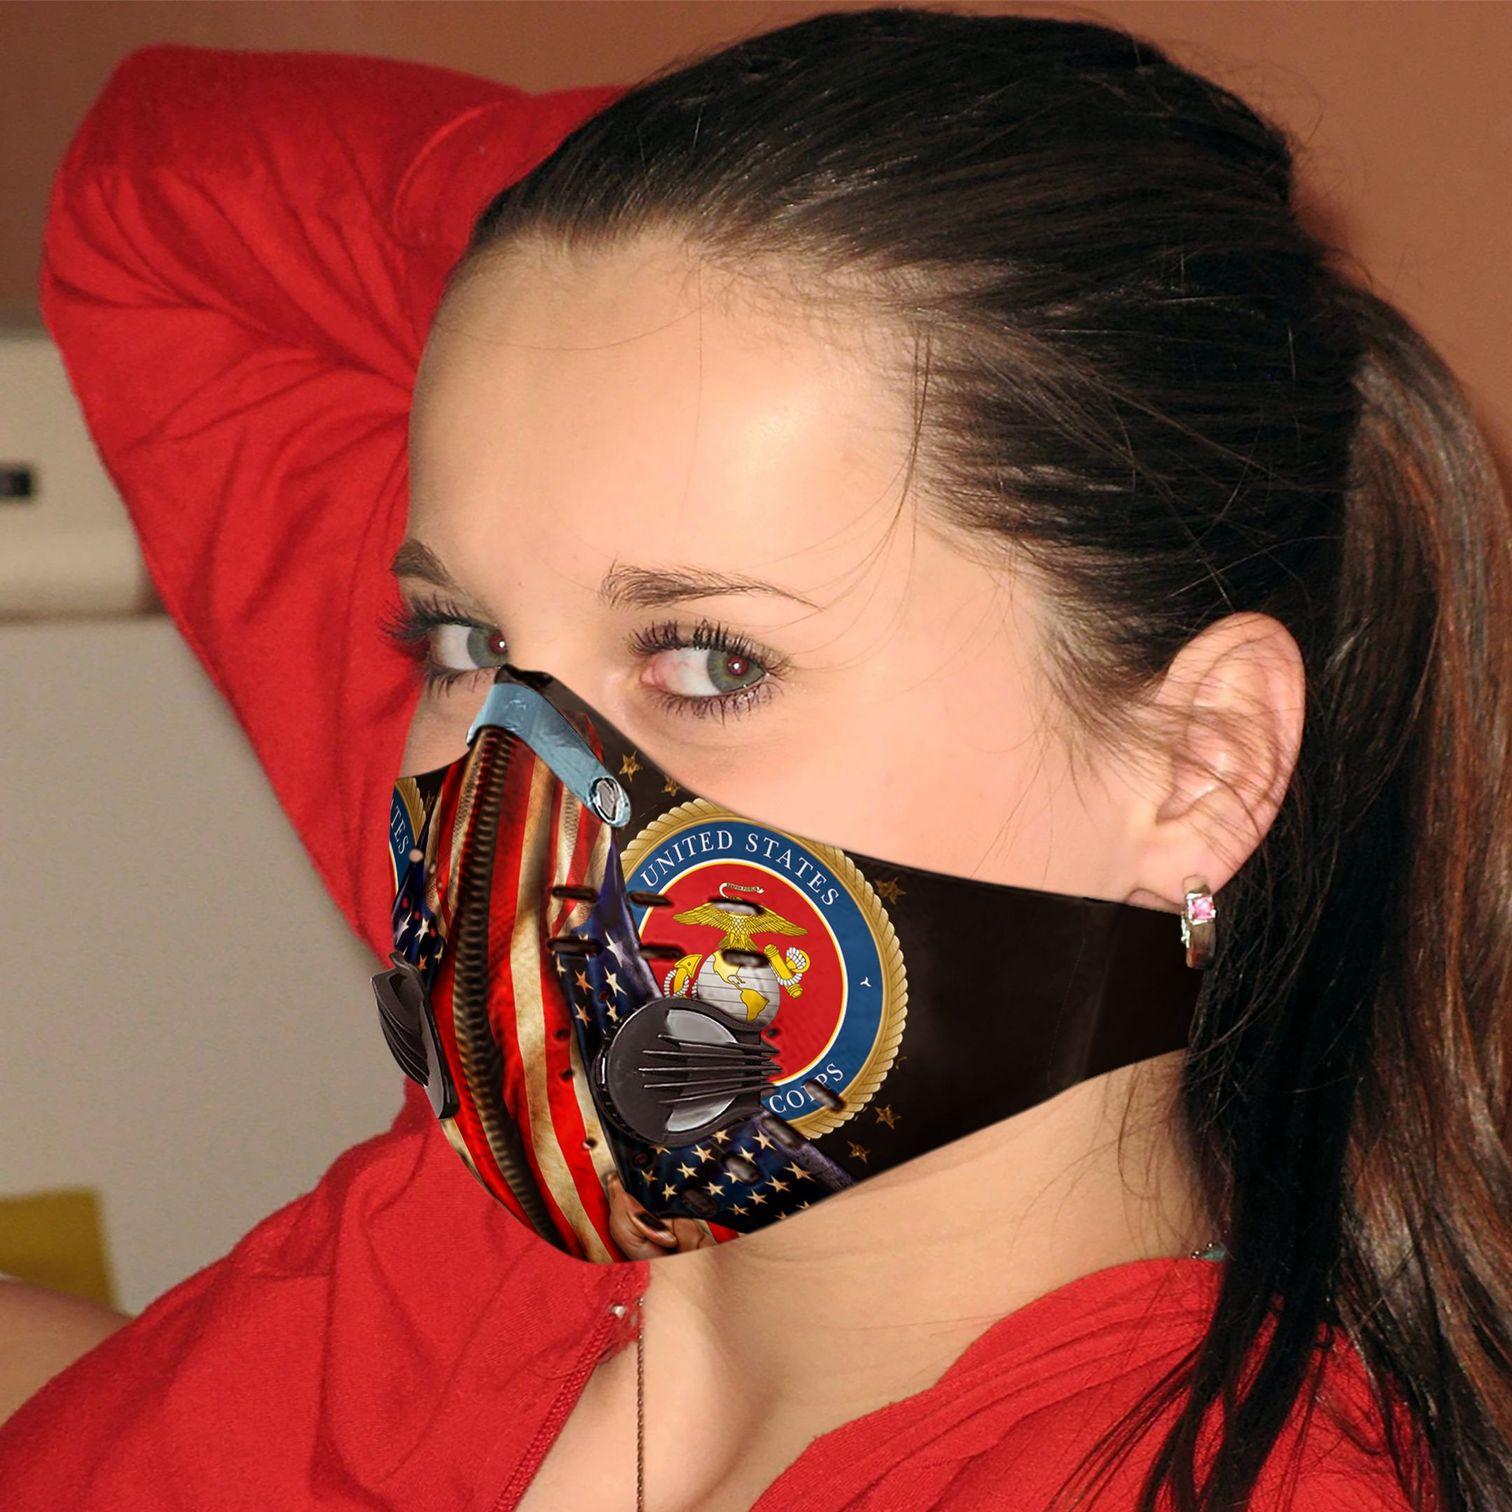 Proud marine corps carbon pm 2,5 face mask 2